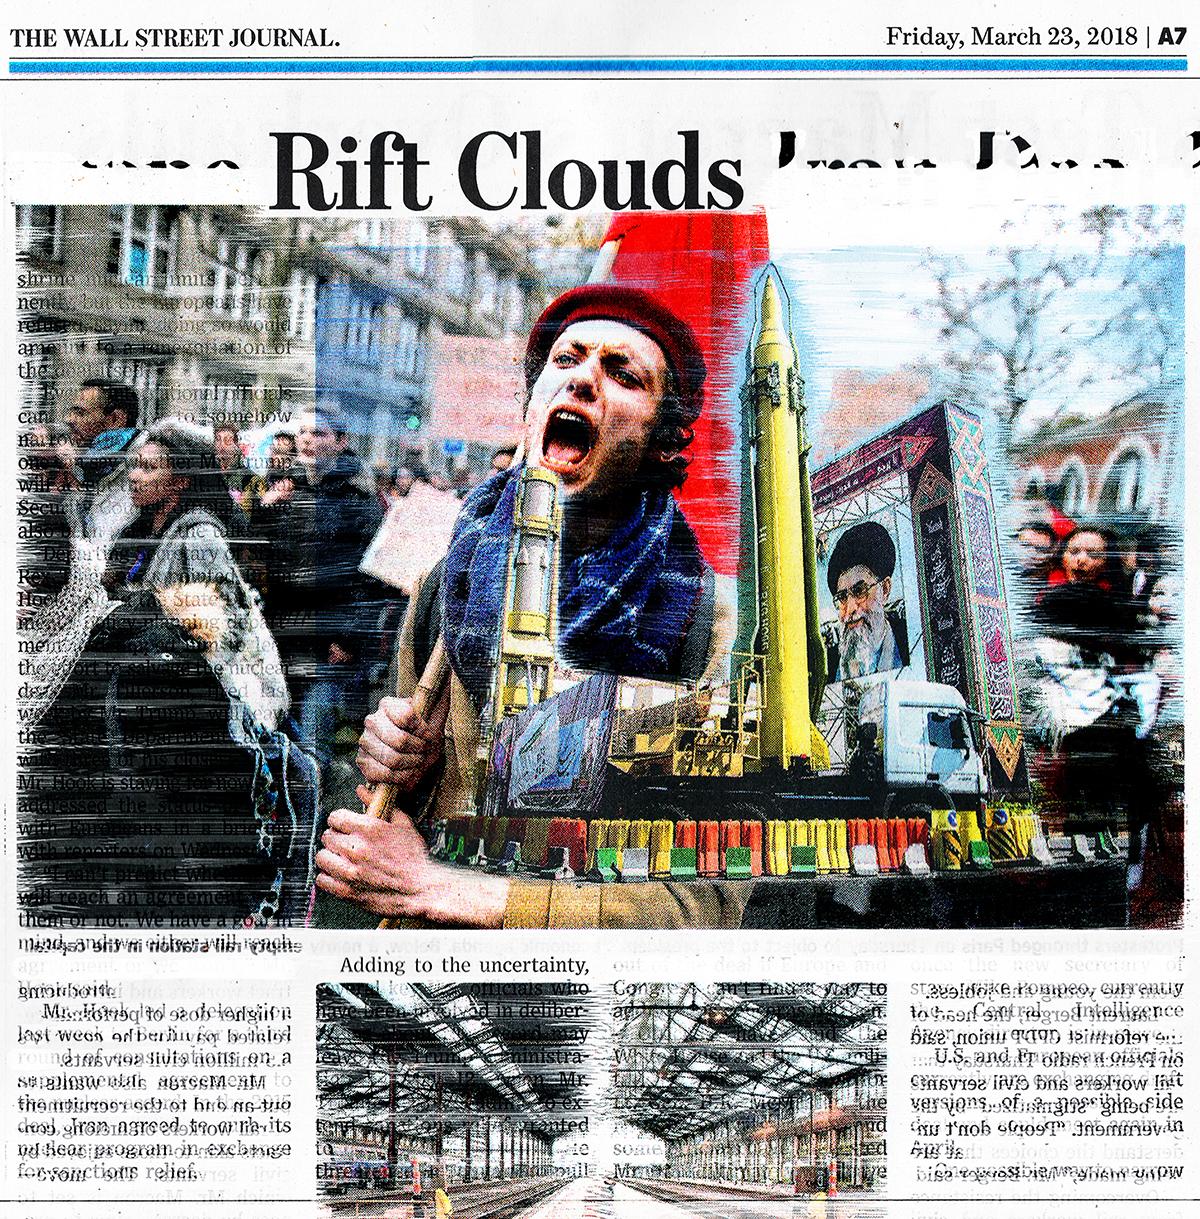 RIFT CLOUDS -